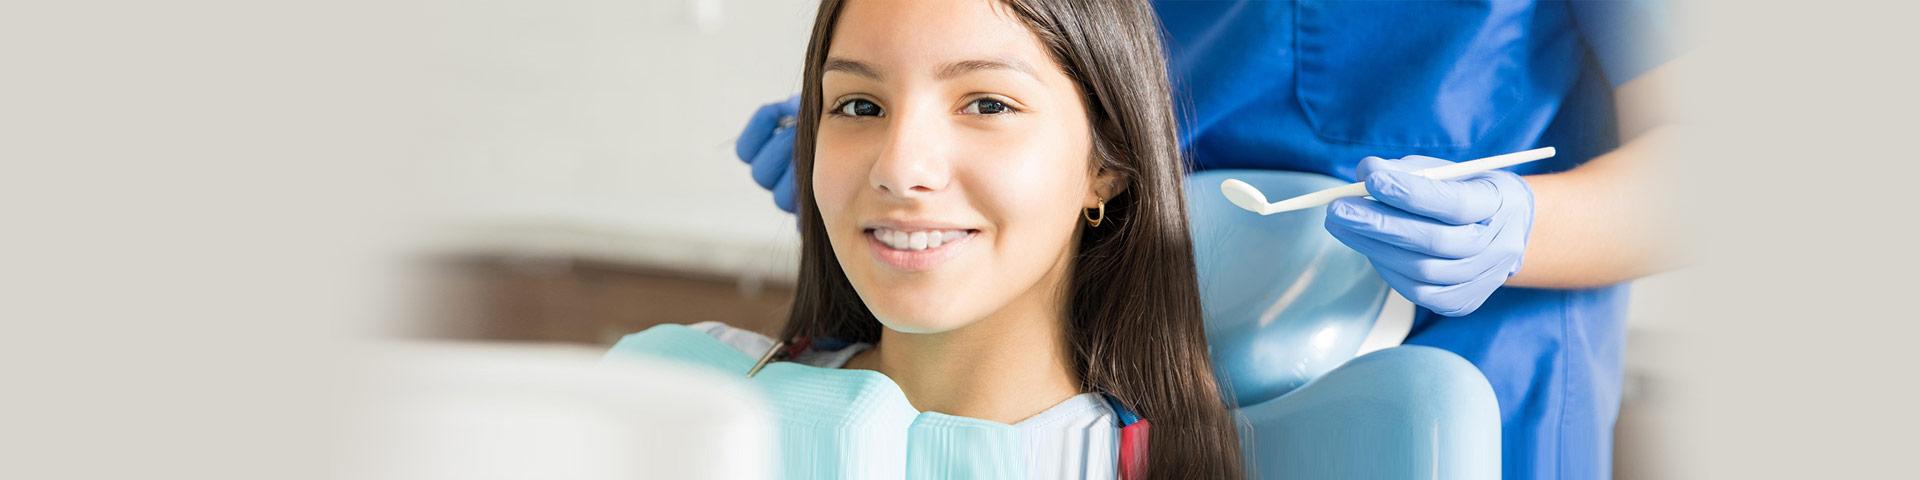 Girl with Dental Sealants treatment at Anchorage Dental Arts